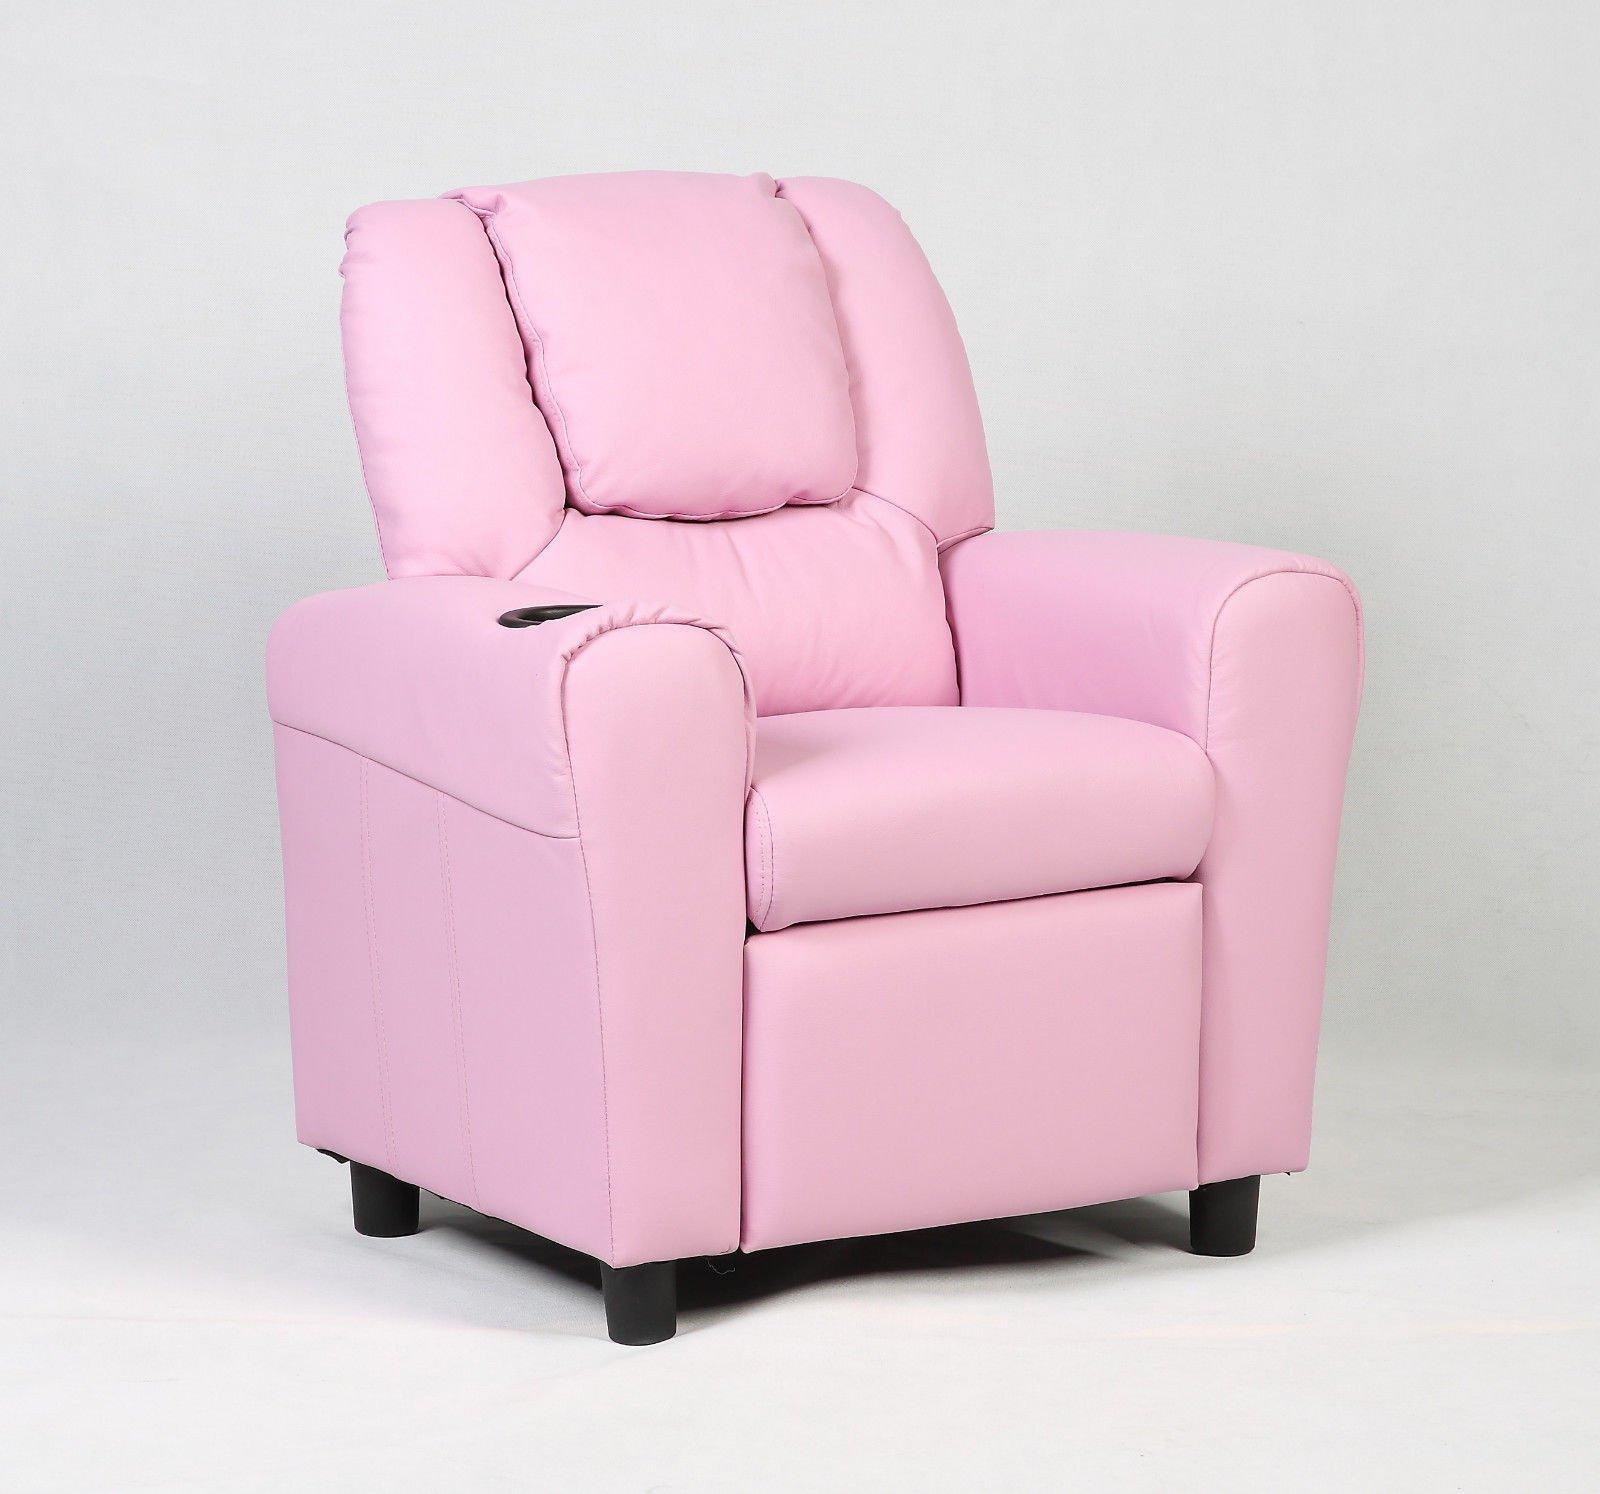 Superb Cheap Recliner Chairs Kids Find Recliner Chairs Kids Deals Andrewgaddart Wooden Chair Designs For Living Room Andrewgaddartcom